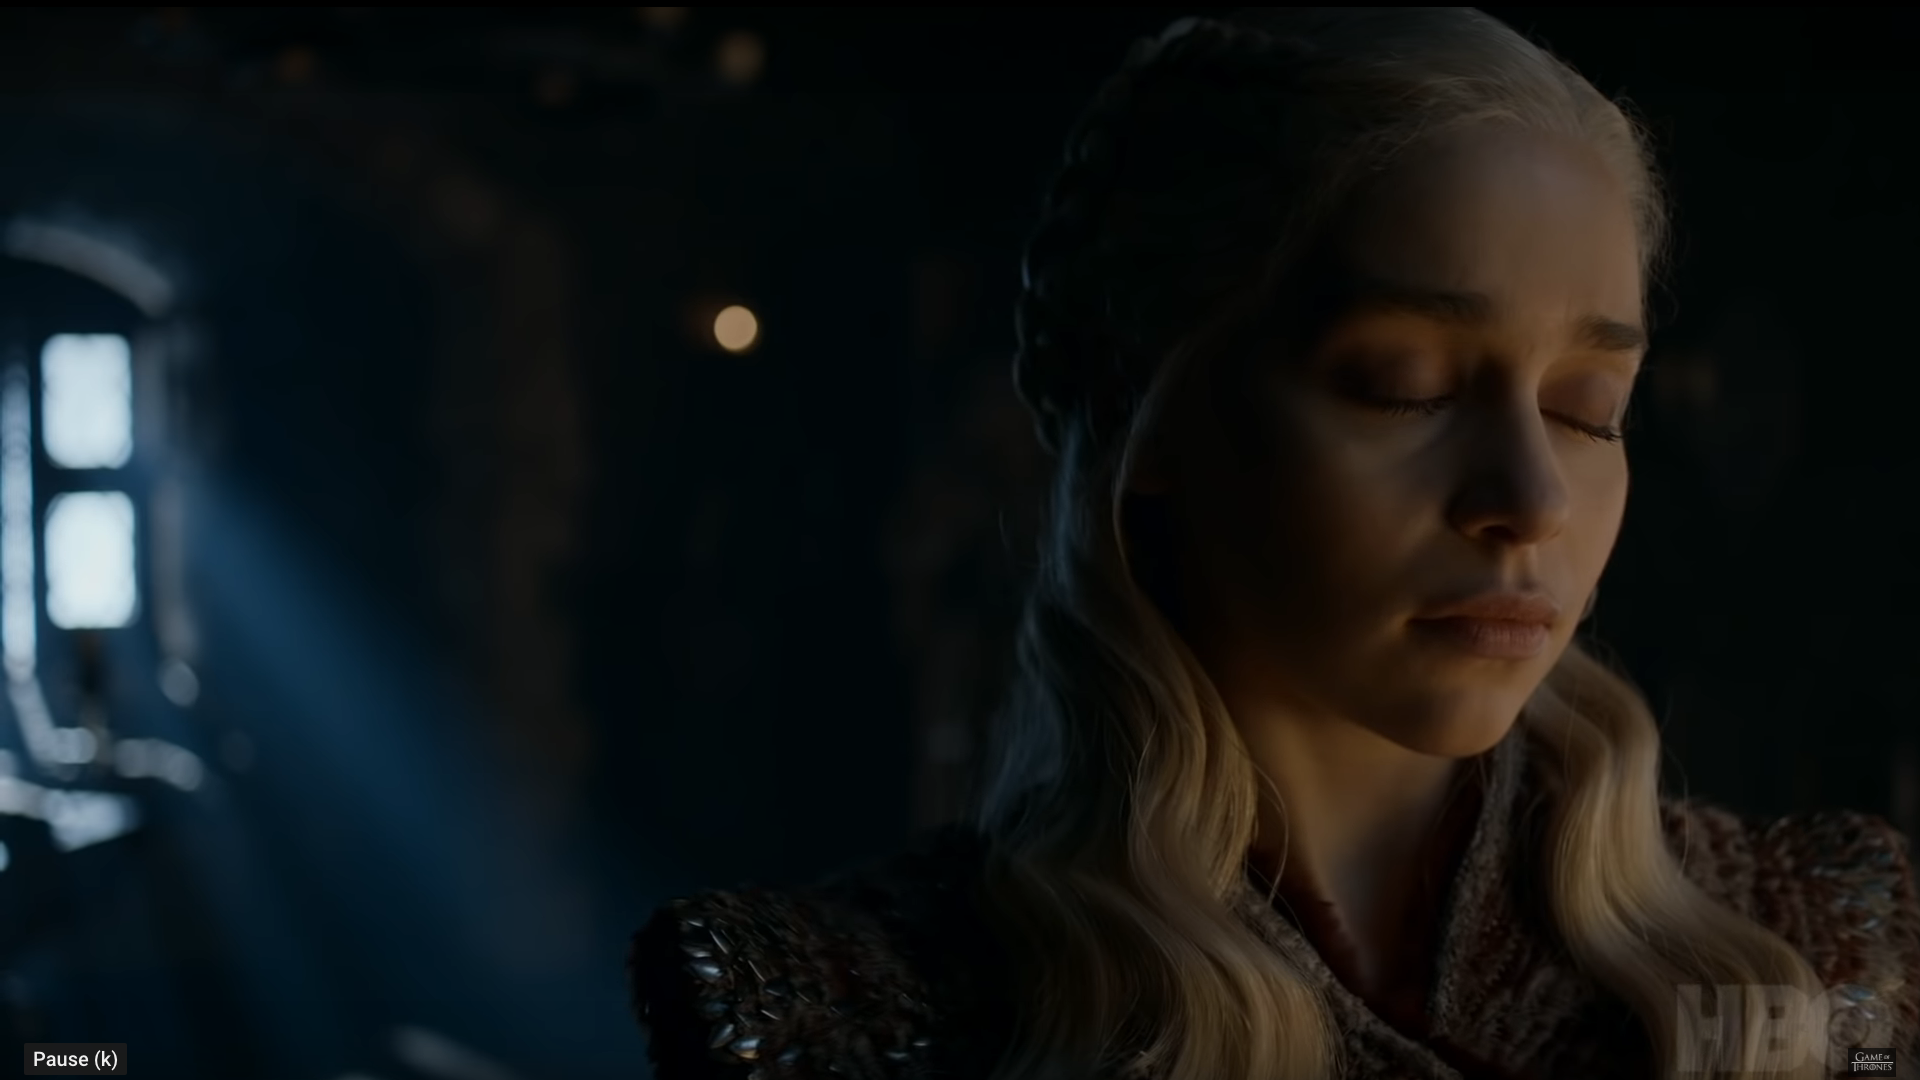 Emilia Clarke Almost Didn't Finish Game of Thrones